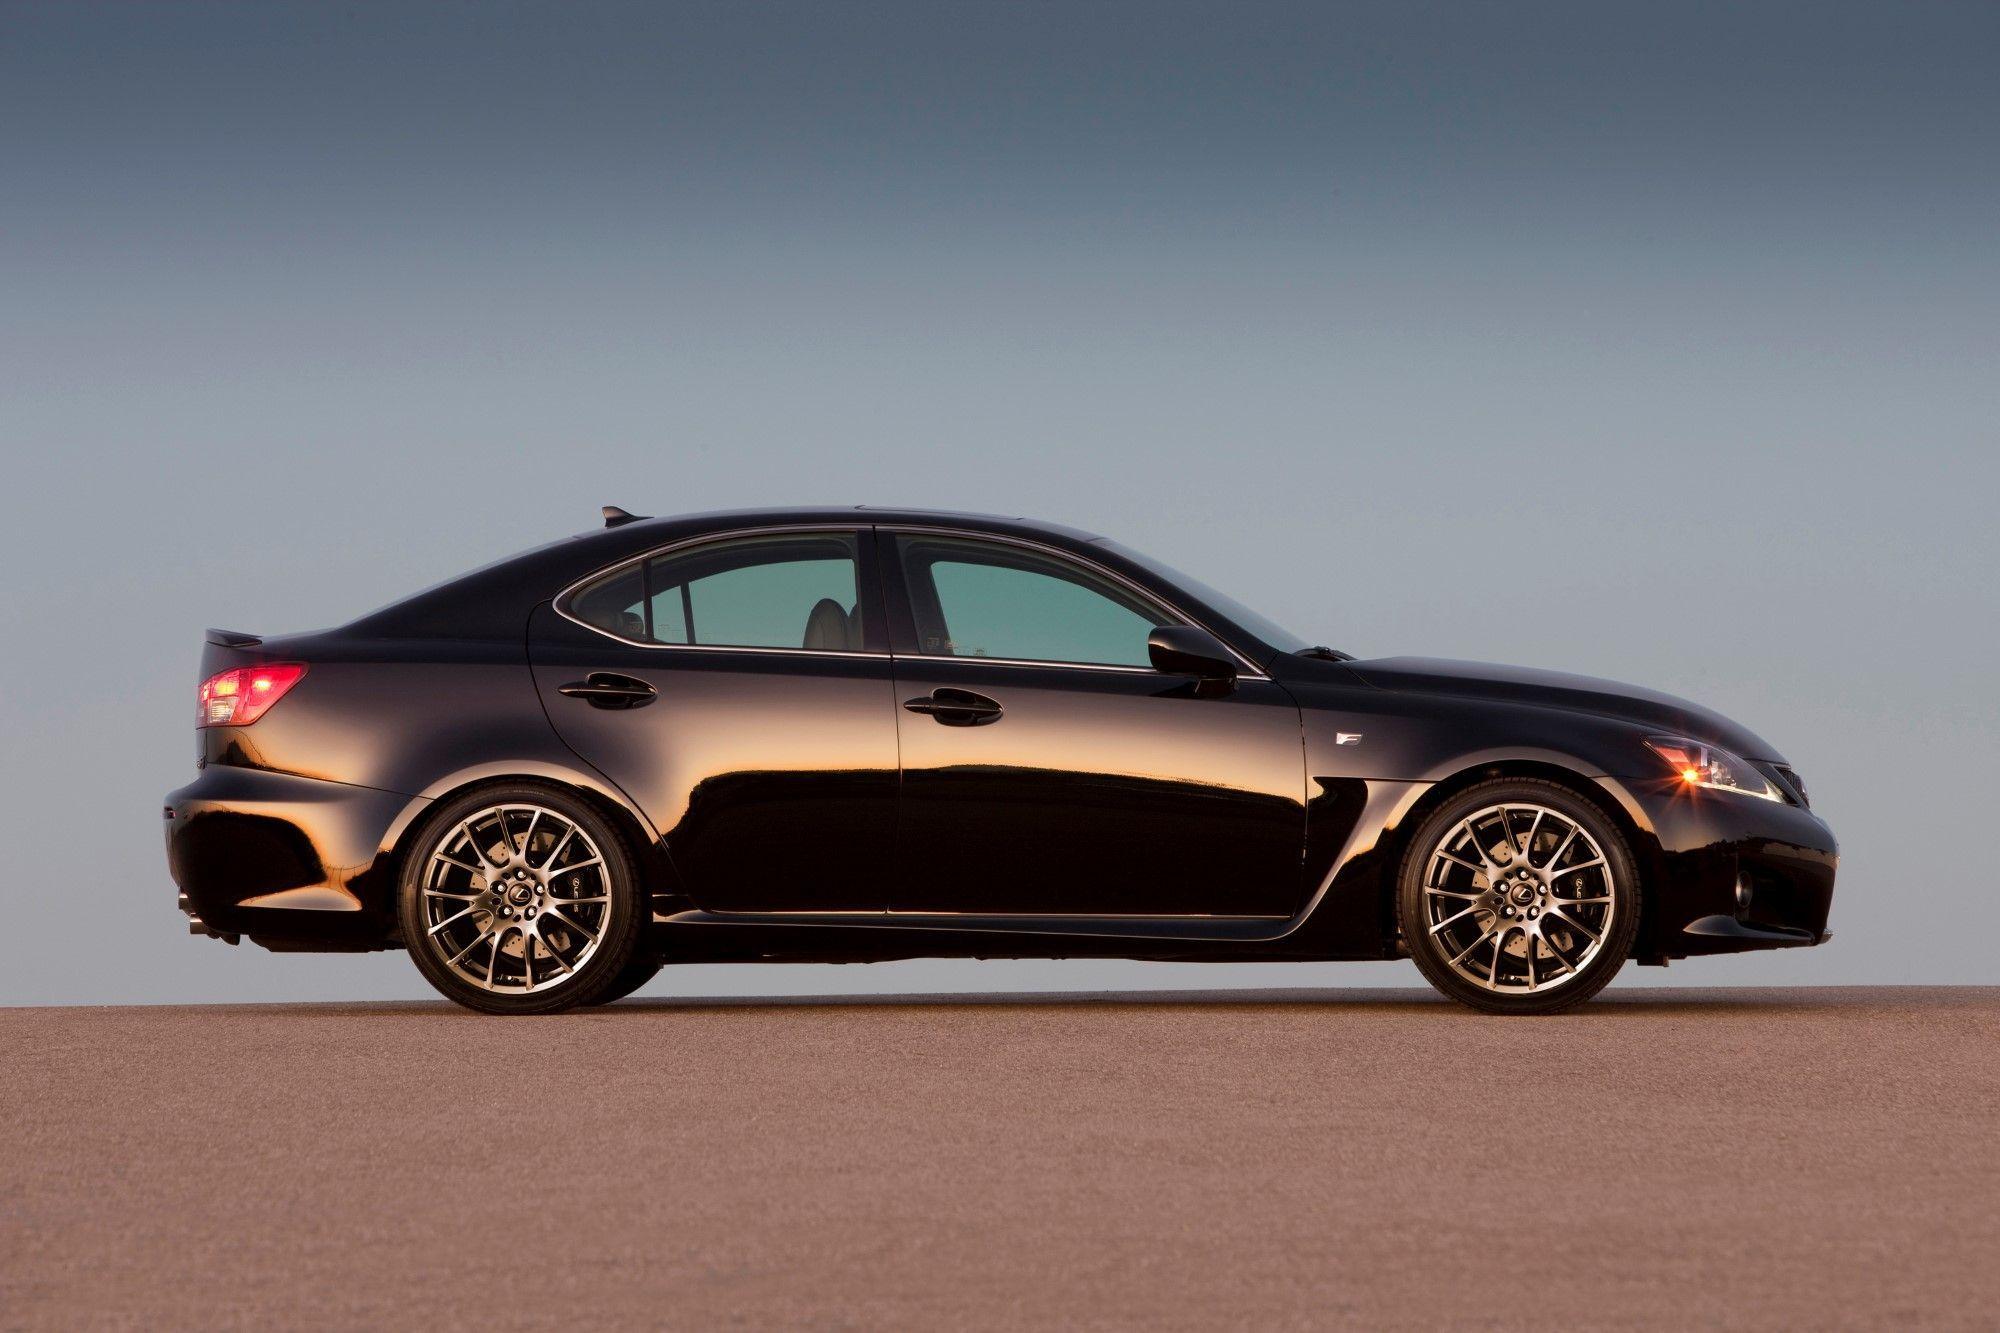 Lexus Isf 2020 Ratings Lexus isf, Lexus, Lexus new car